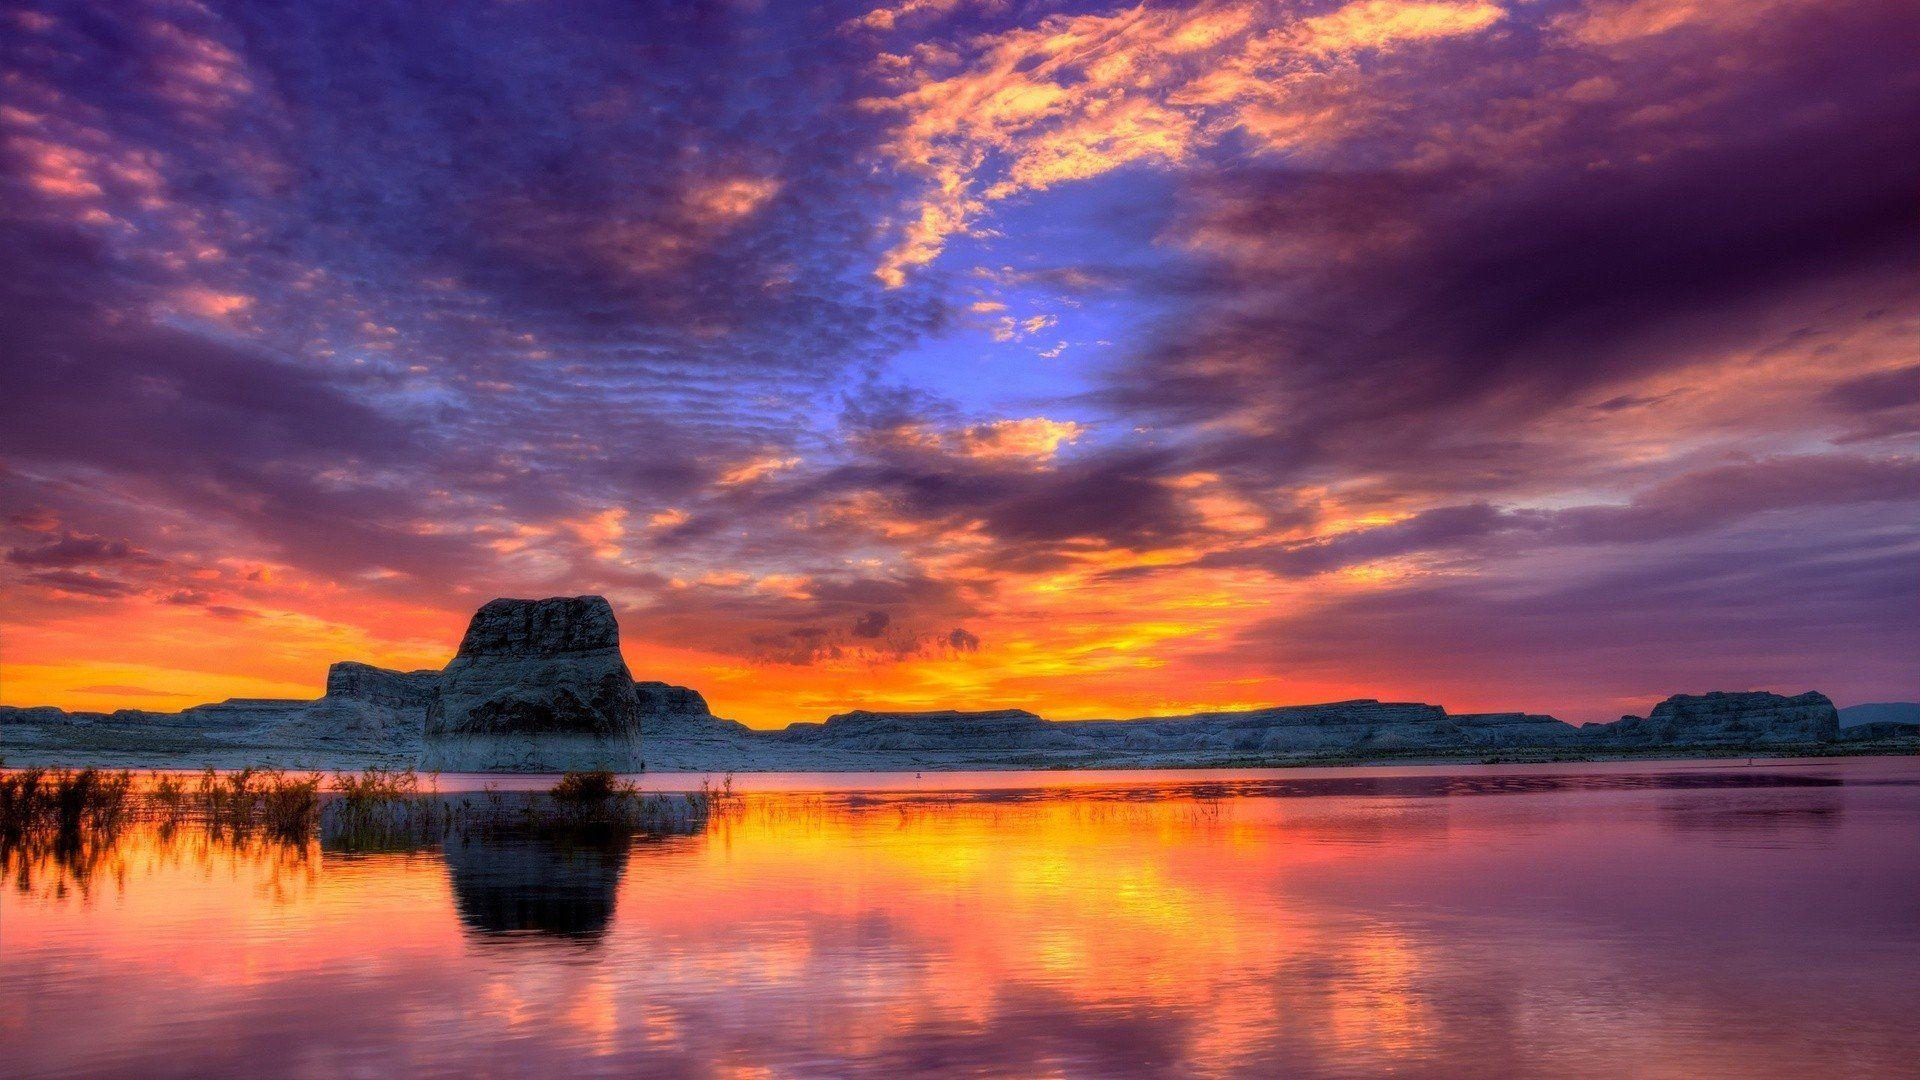 4k Sunset Wallpaper Sunset Landscape Sunset Wallpaper Landscape Photography